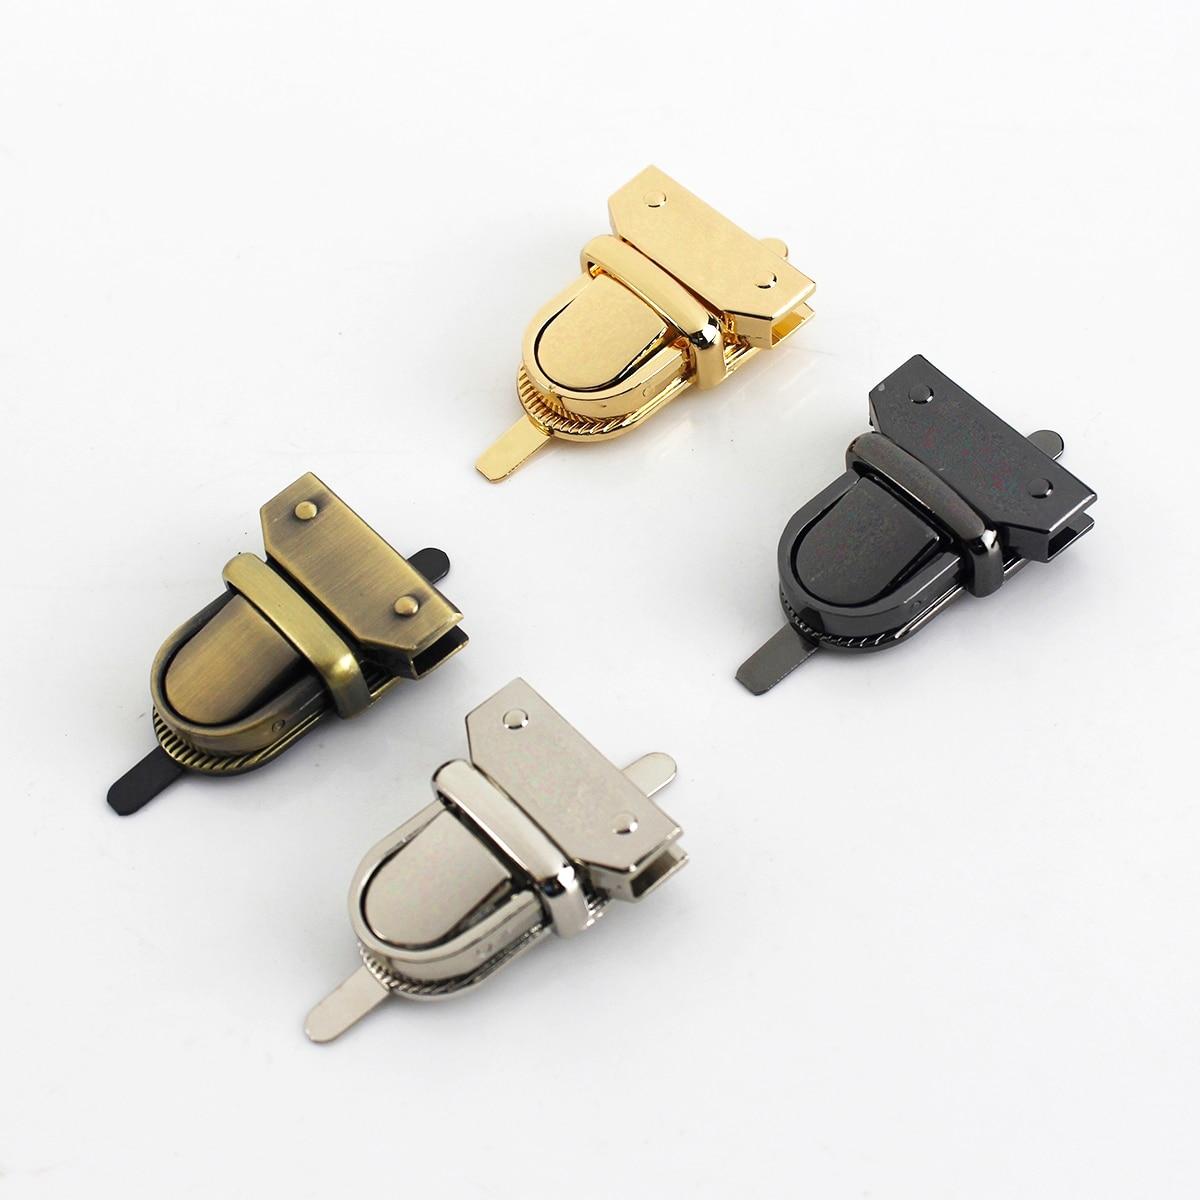 1pcs Metal Press Push Lock Tongue lock Bag Briefcase Spring Lock Snap Decorative Clasps Closure Leat